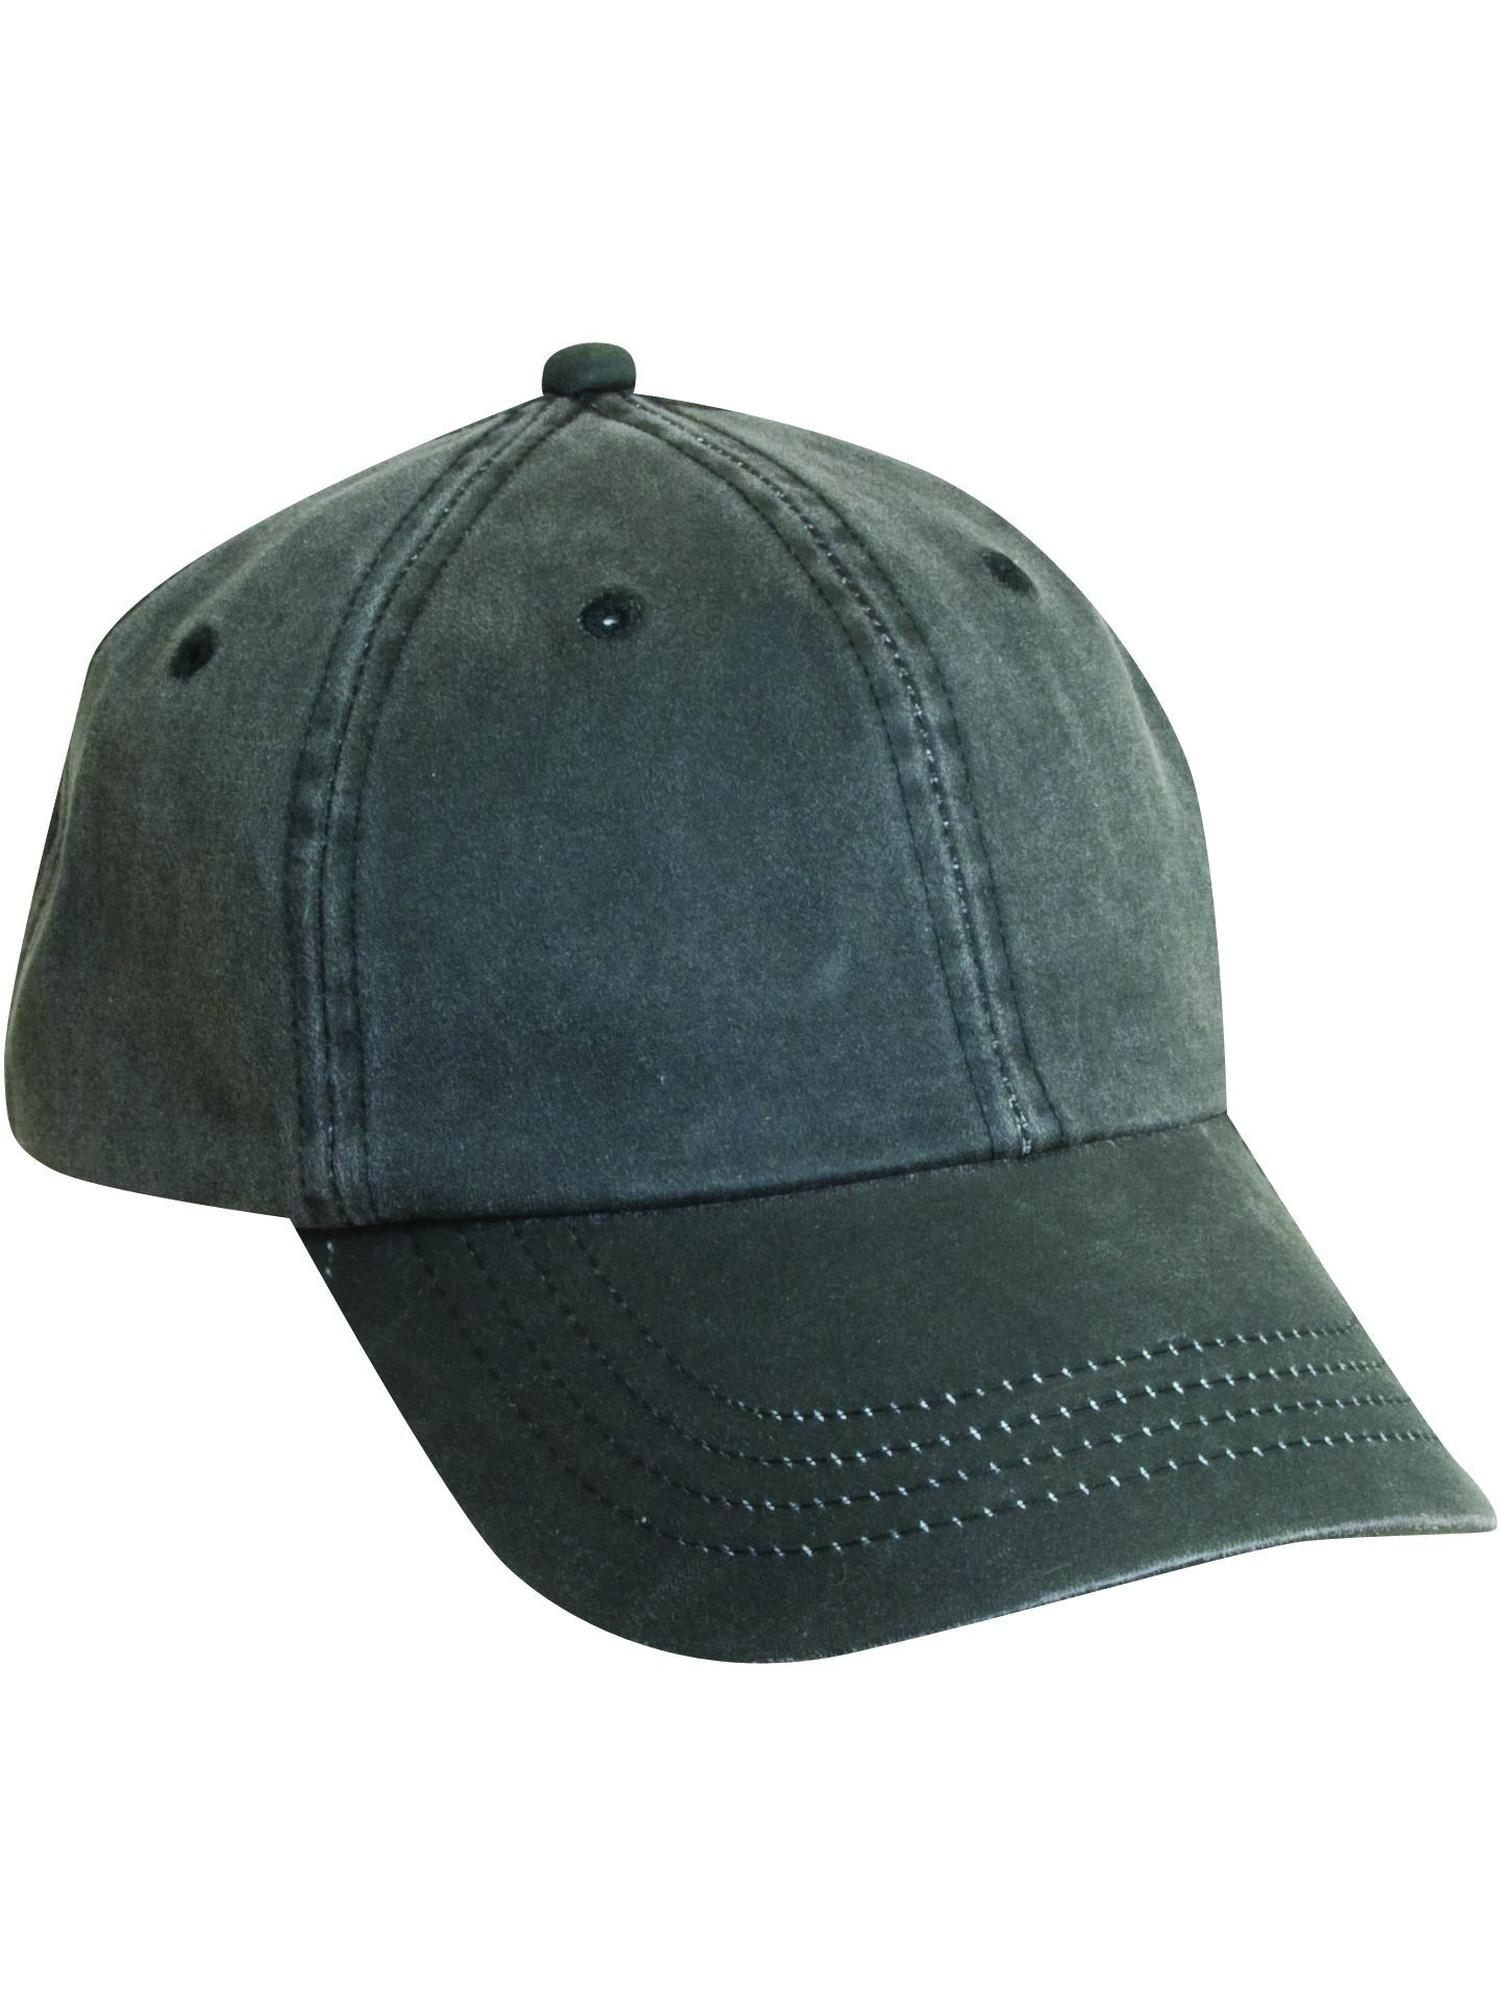 76f5dfa65 Size one size Weathered Cotton UPF 50 Adjustable Baseball Hat